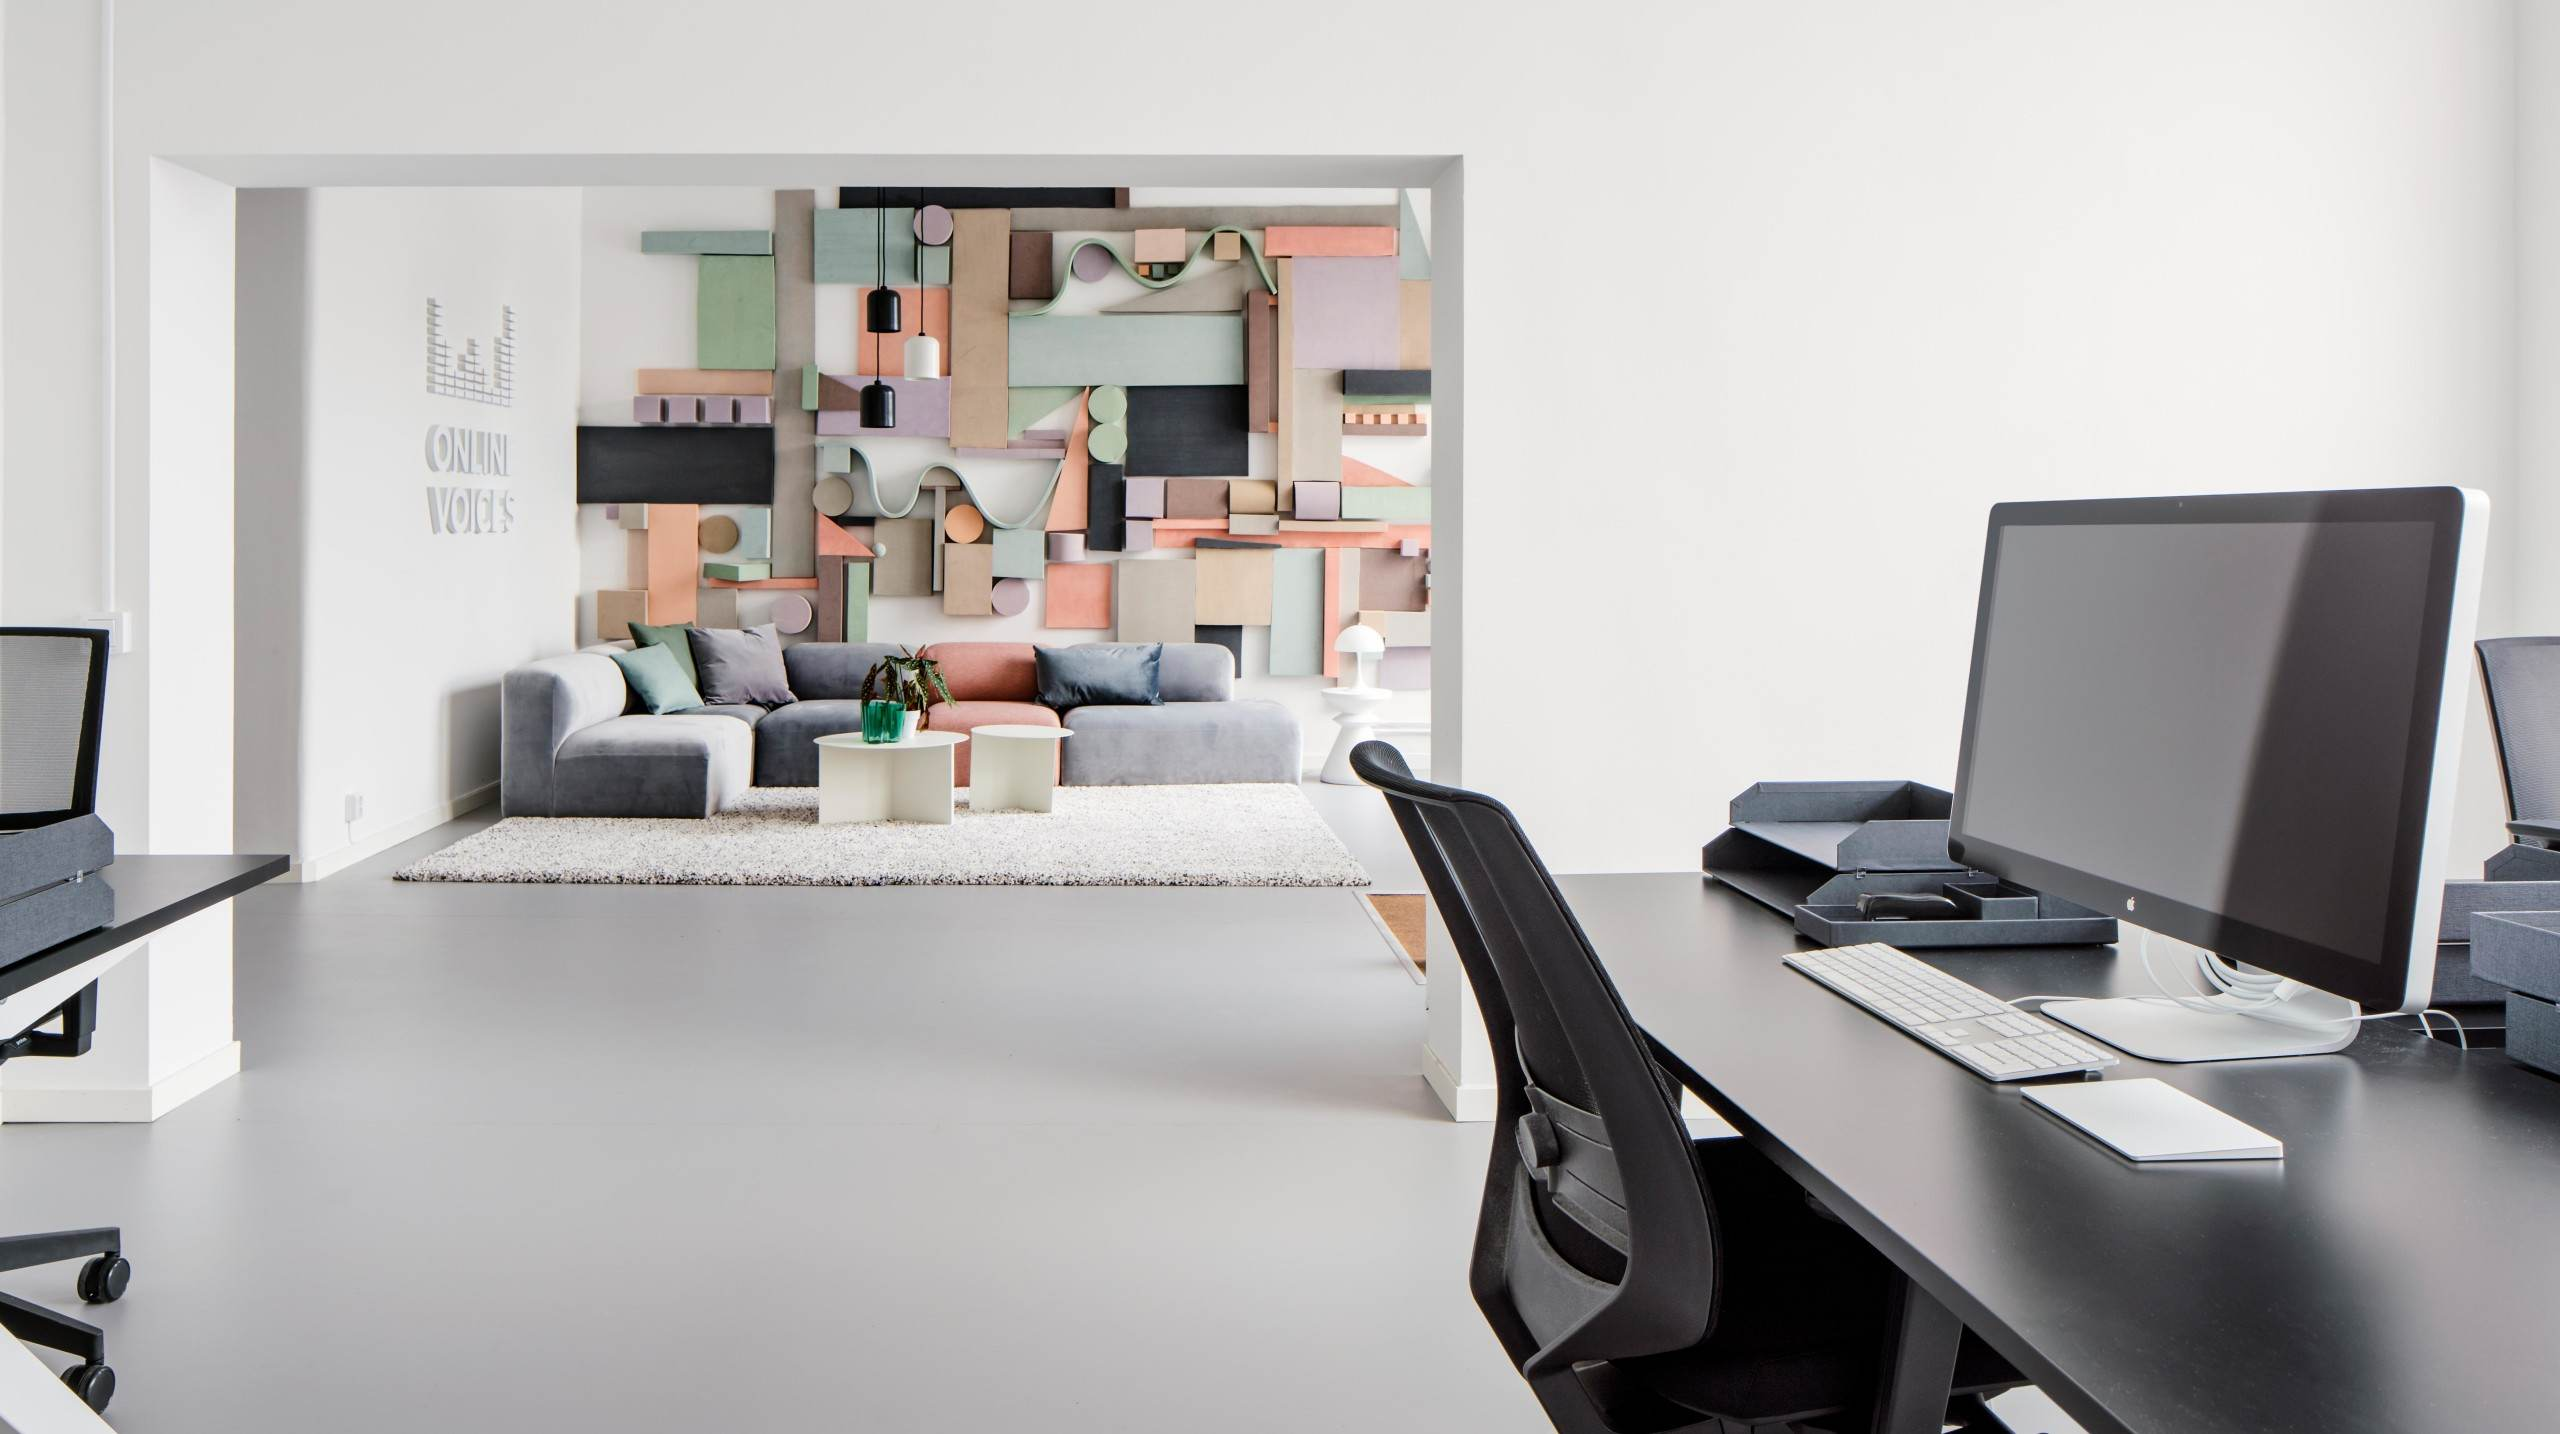 Online Voices kontor i Stockholm, fotograferat av arkitekturfotograf Mattias Hamrén.